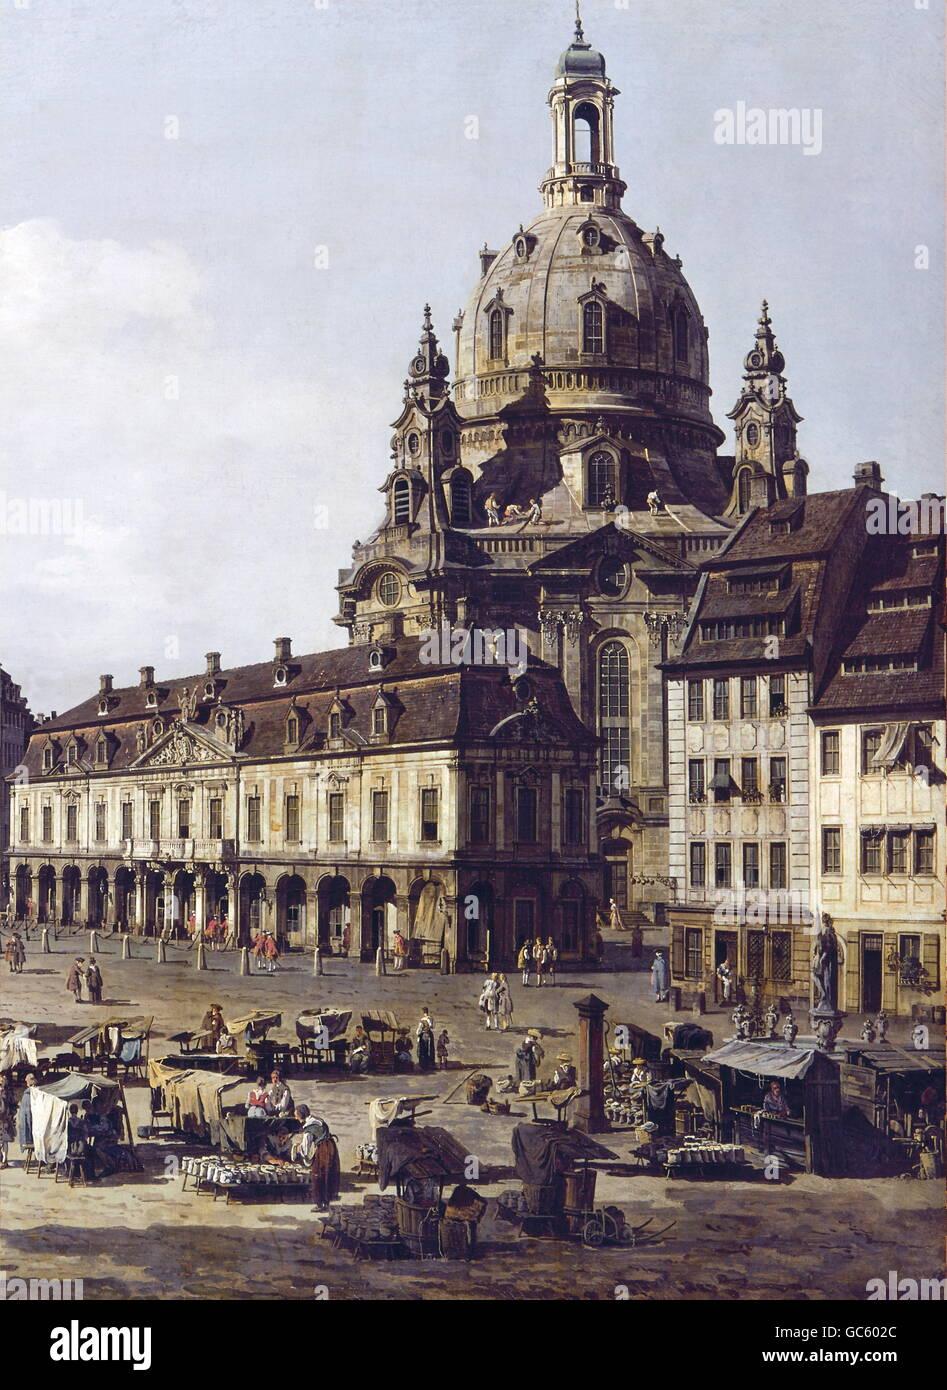 "fine arts, Bellotto, Bernardo, (called: Canaletto), (20.5.1722 - 17.11.1780), painting, ""Der Neumarkt in Dresden Stock Photo"